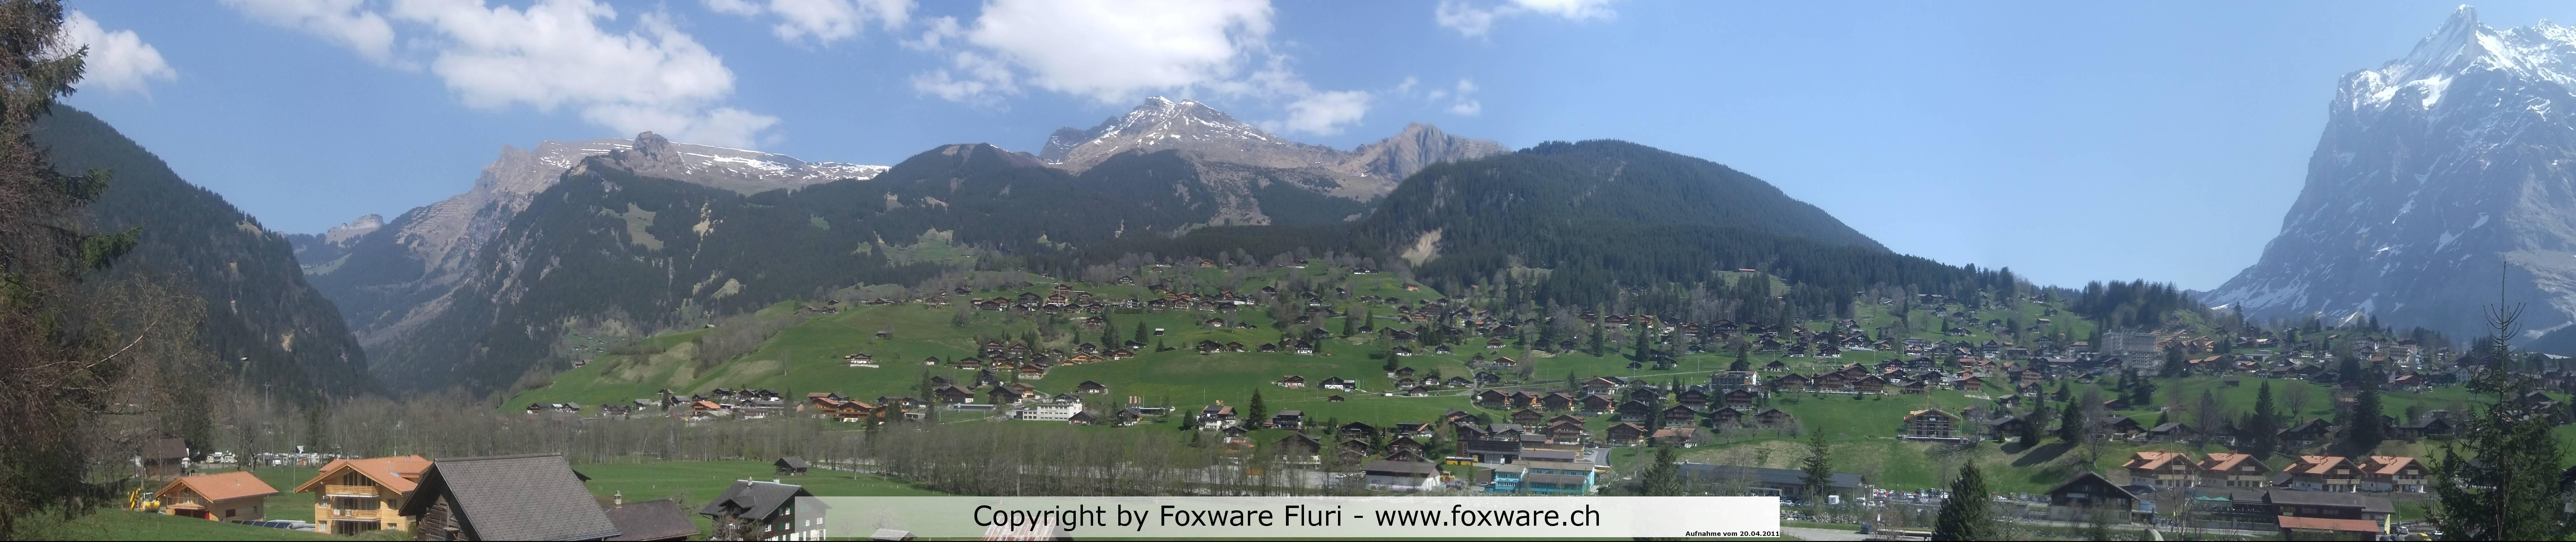 Panoramabild Grindelwald im Sommer